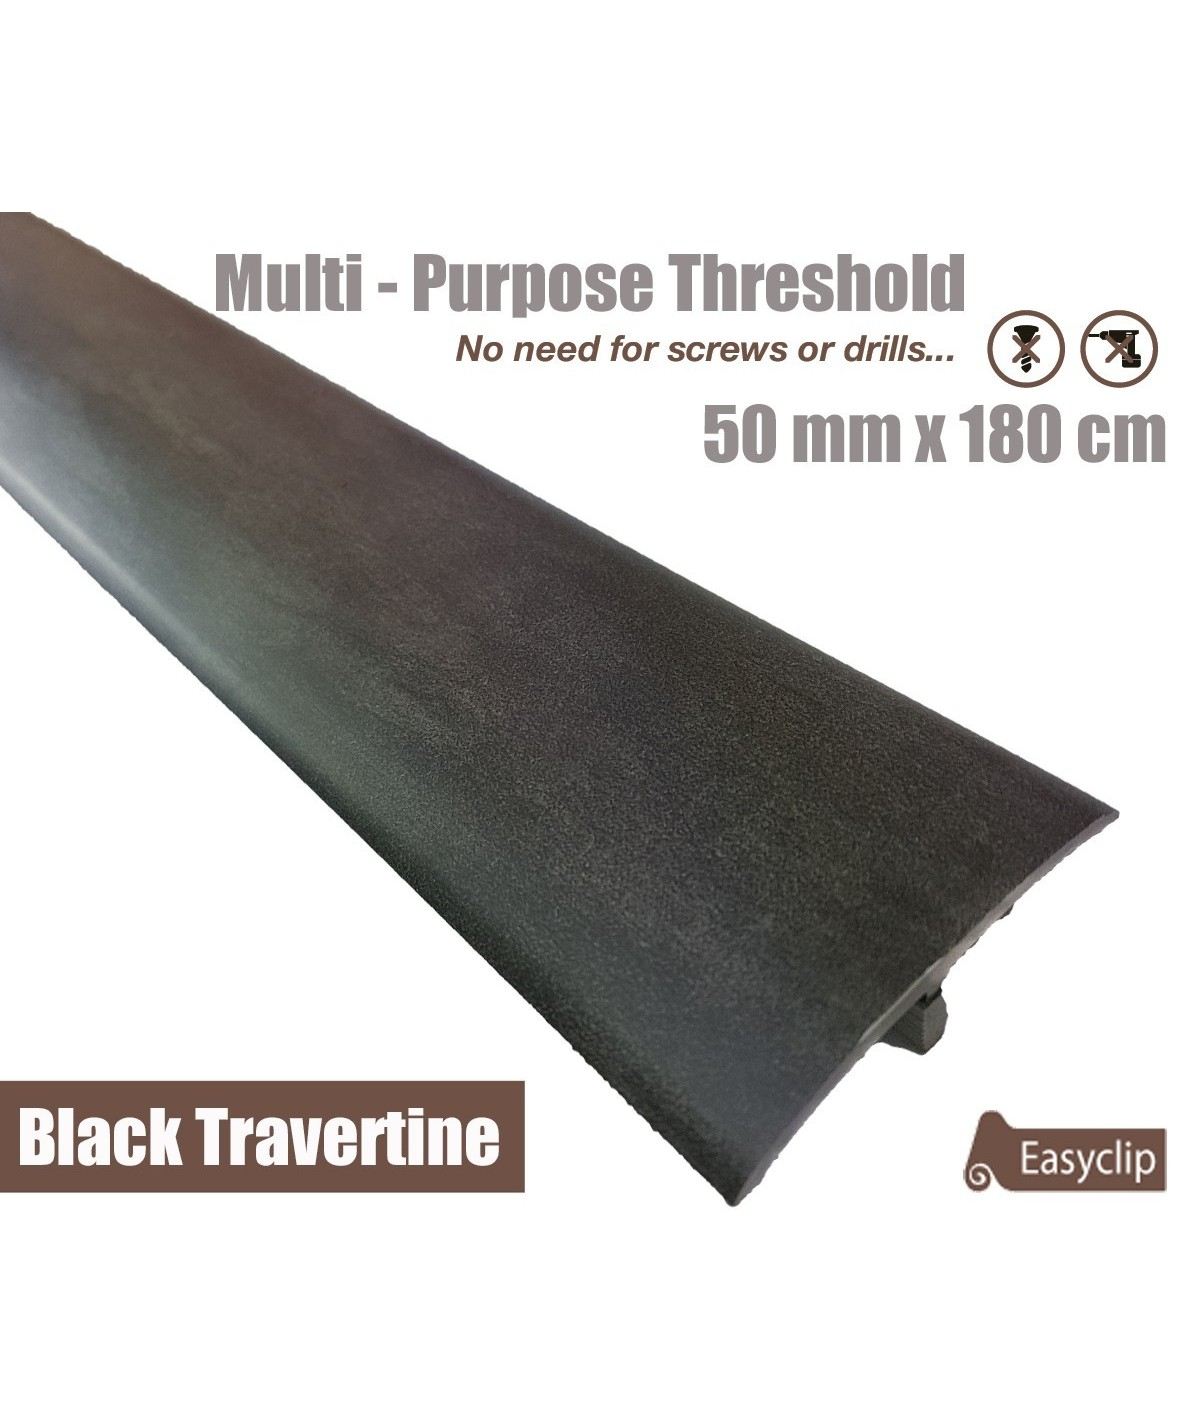 Black Travertine Laminated Transition Threshold Strip  50mm x180cm Multi-Height/Pivots